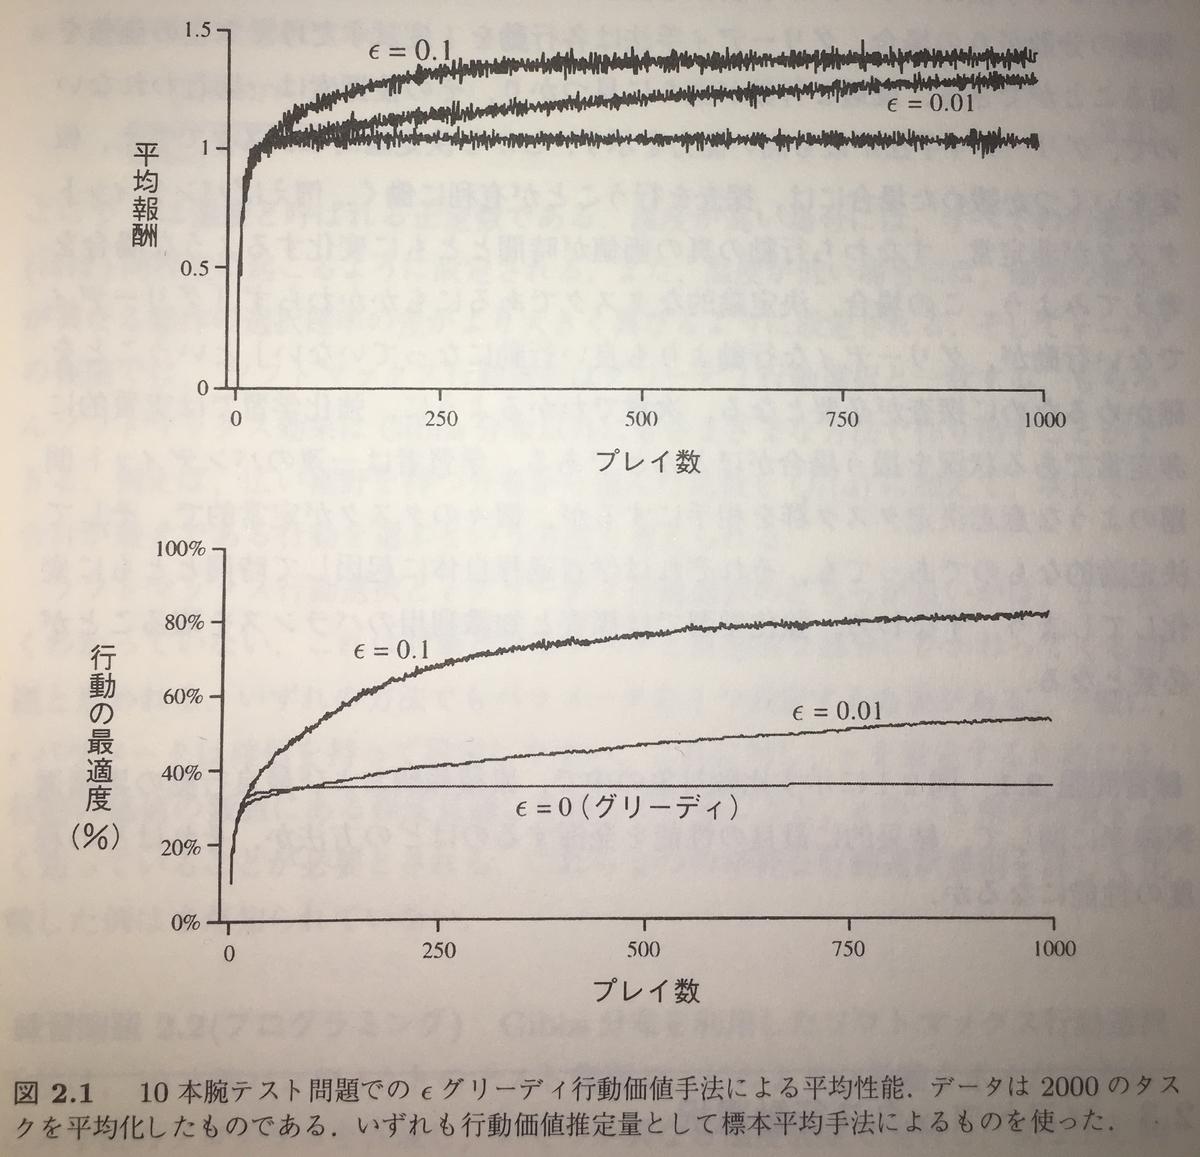 f:id:ishiyama-katsuya:20190503195642j:plain